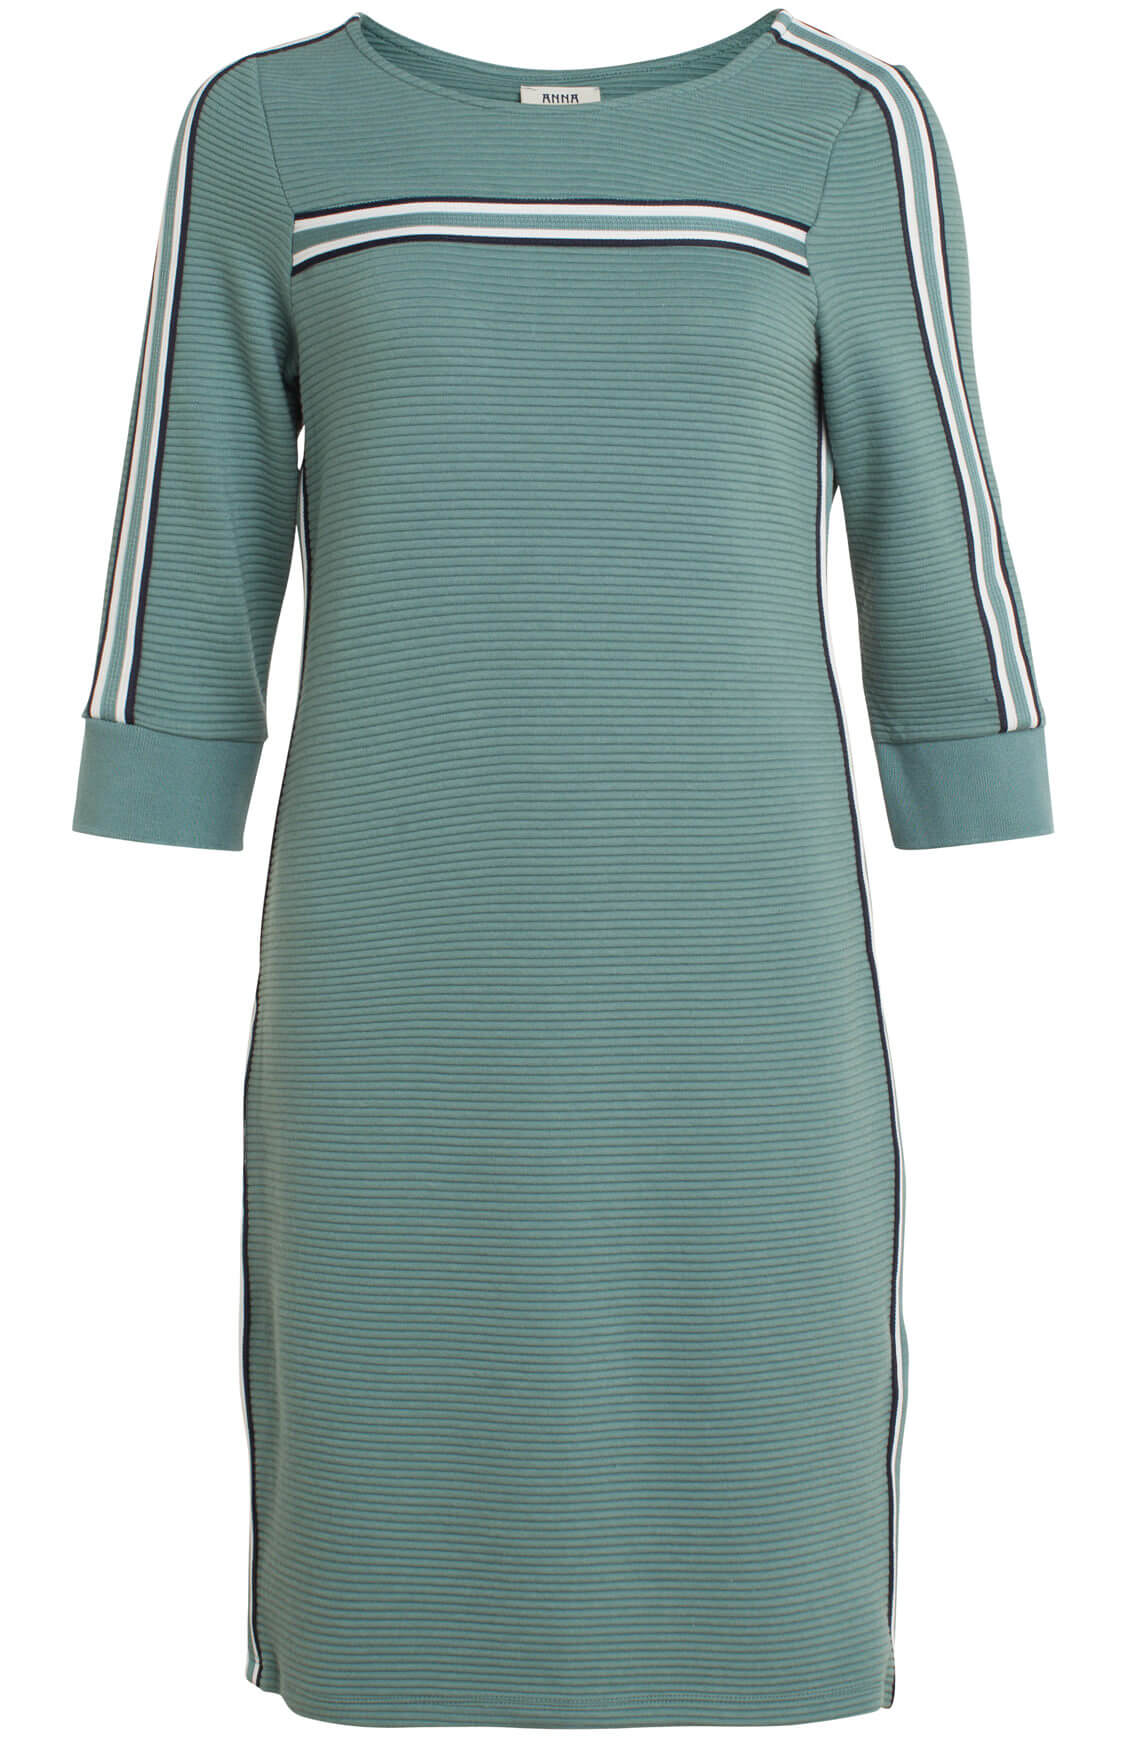 Anna Blue Dames Ribgebreide jurk groen